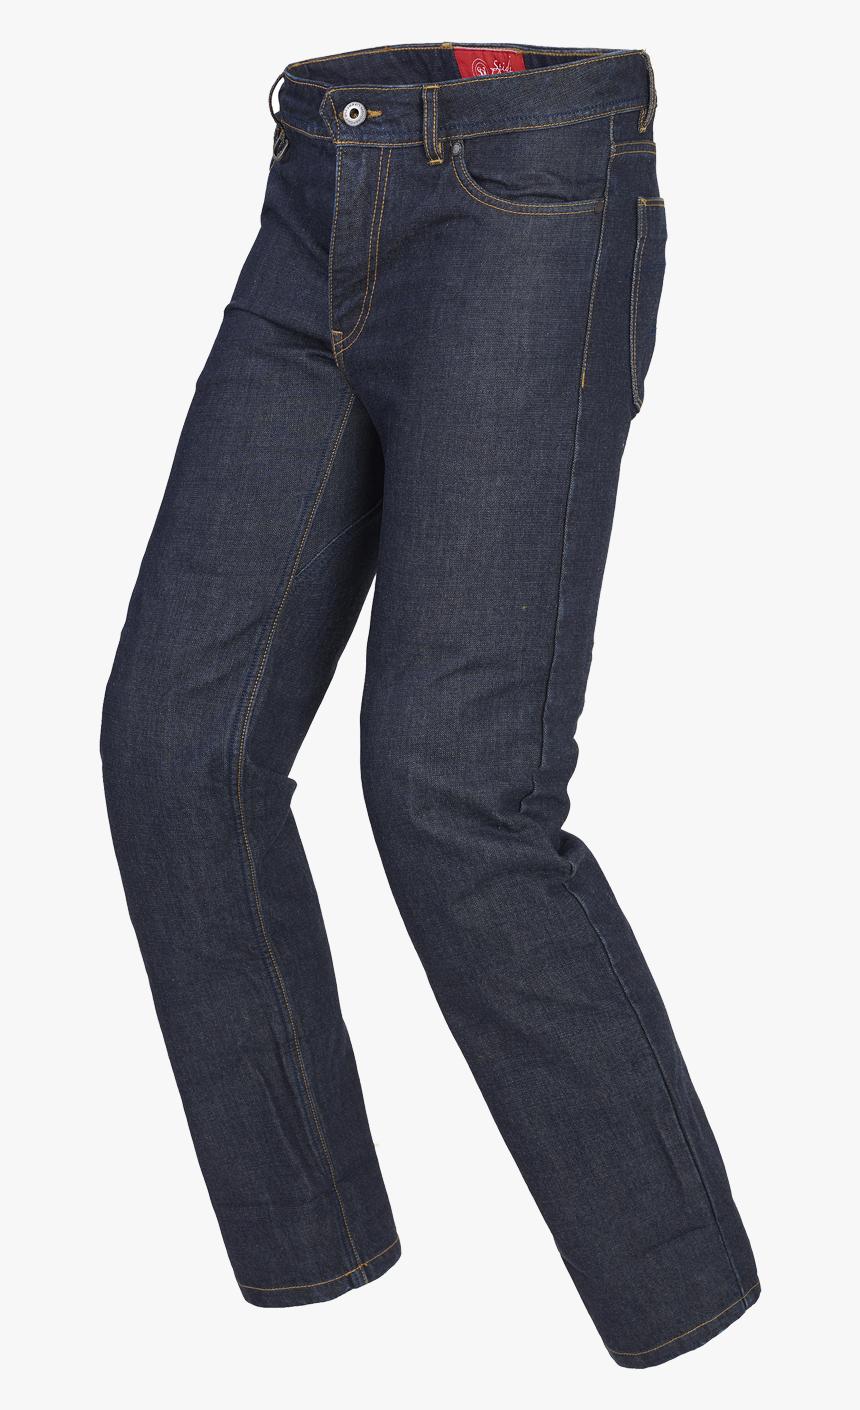 Jeans Pant , Png Download - Jeans Pant, Transparent Png, Free Download